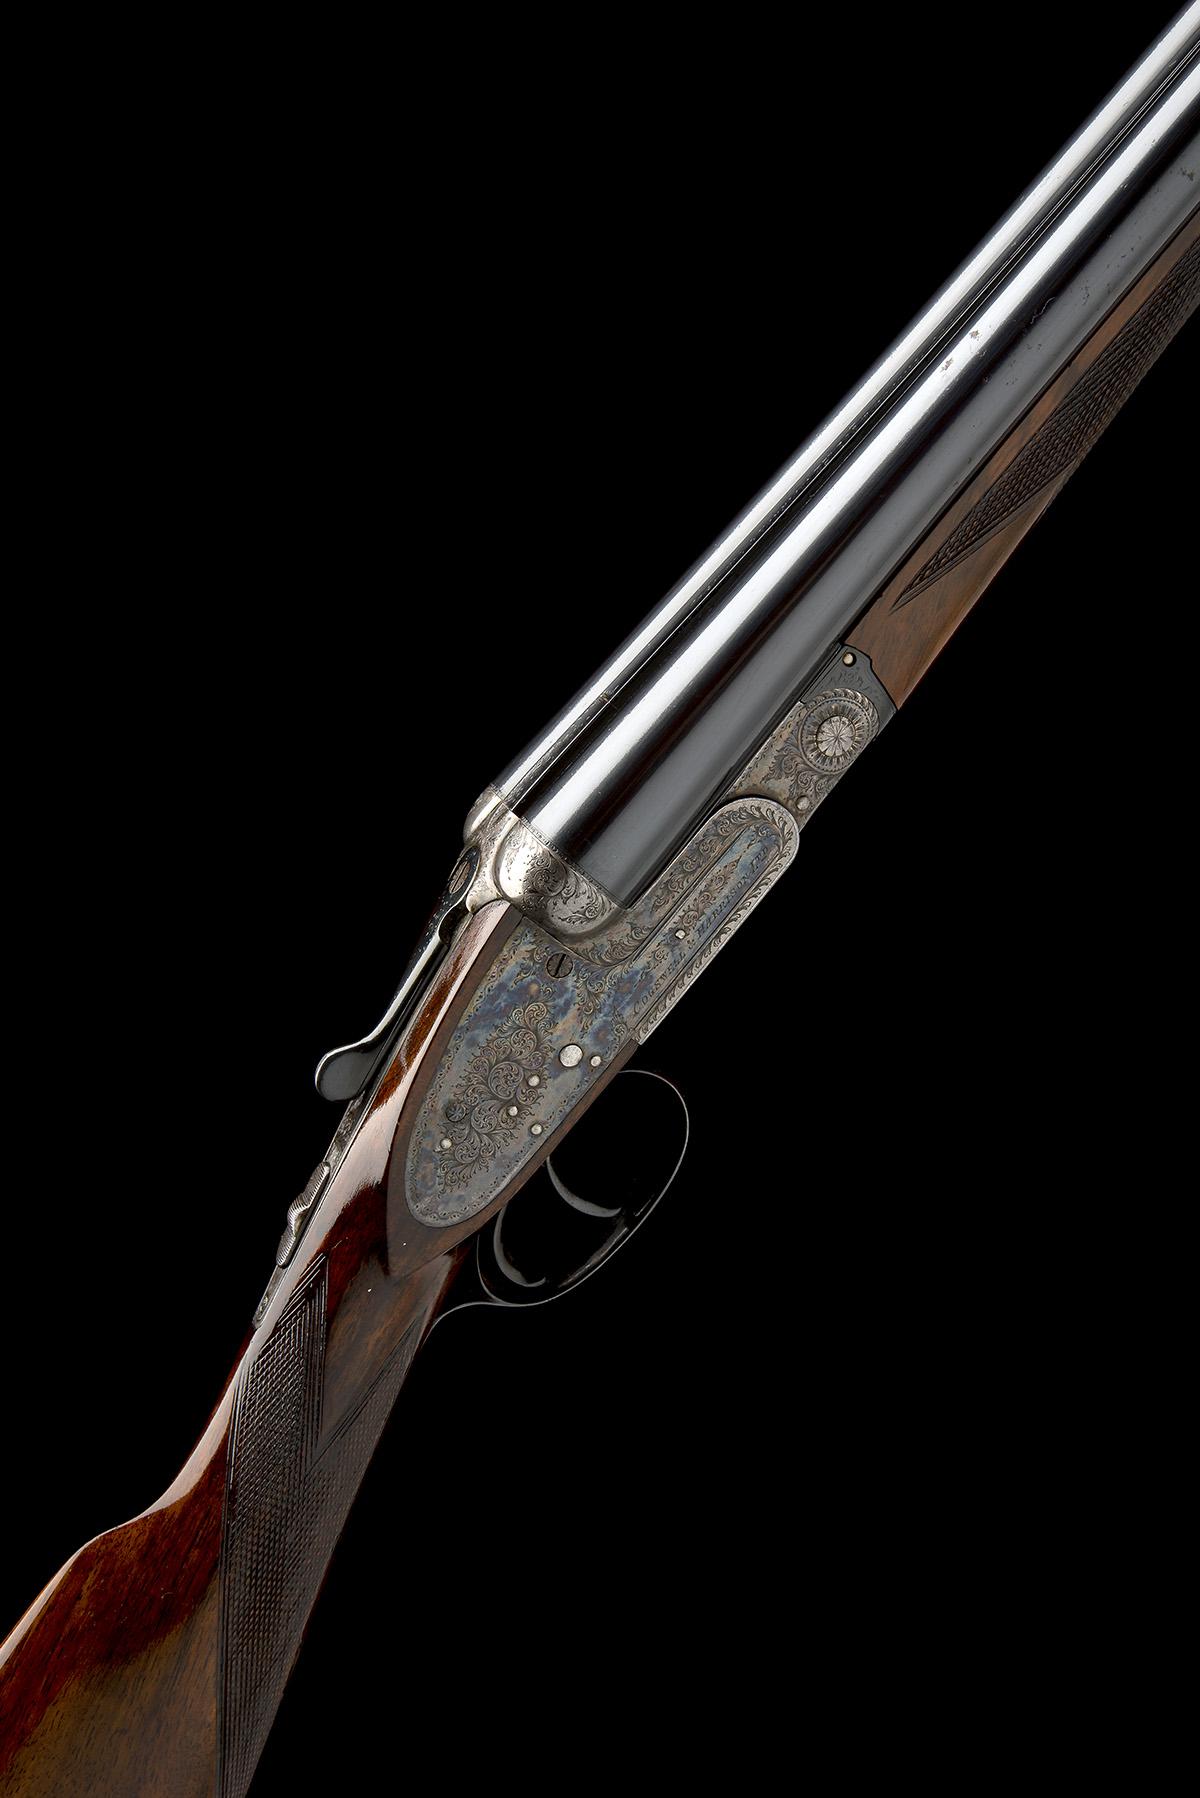 COGSWELL & HARRISON A 12-BORE SIDELOCK EJECTOR, serial no. 56378, circa 1929, 27 1/2in. (70cm) nitro